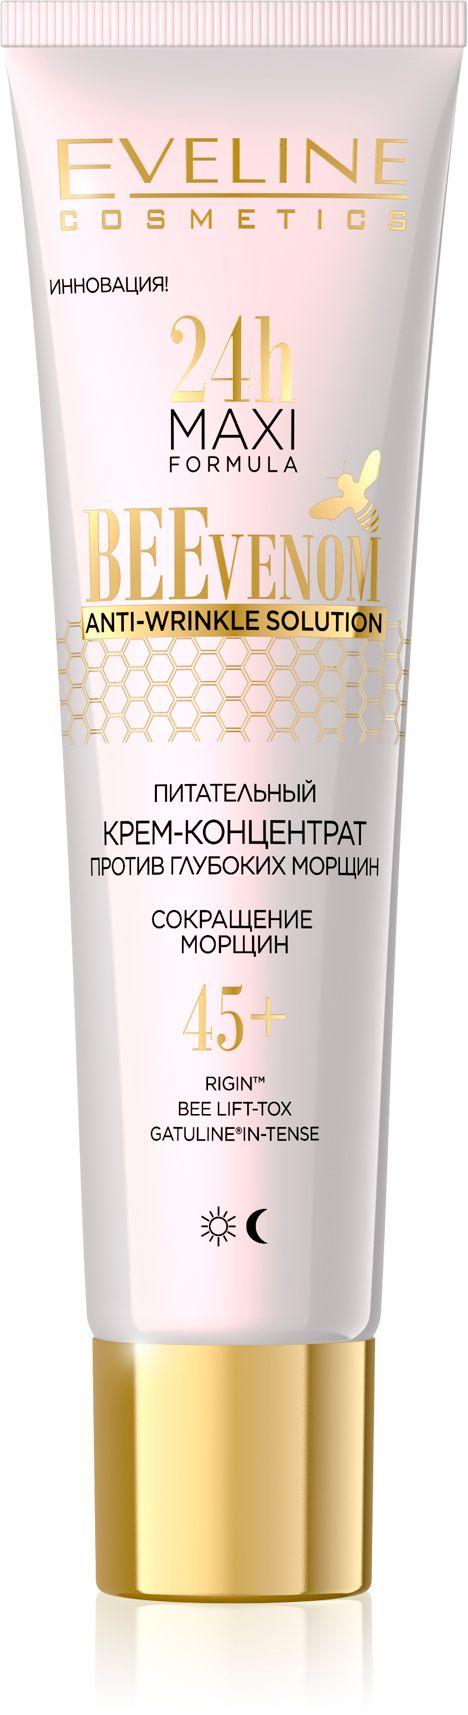 Nourishing cream concentrate against deep wrinkles 45+ 24h series maxi formula, Avon, 40 ml